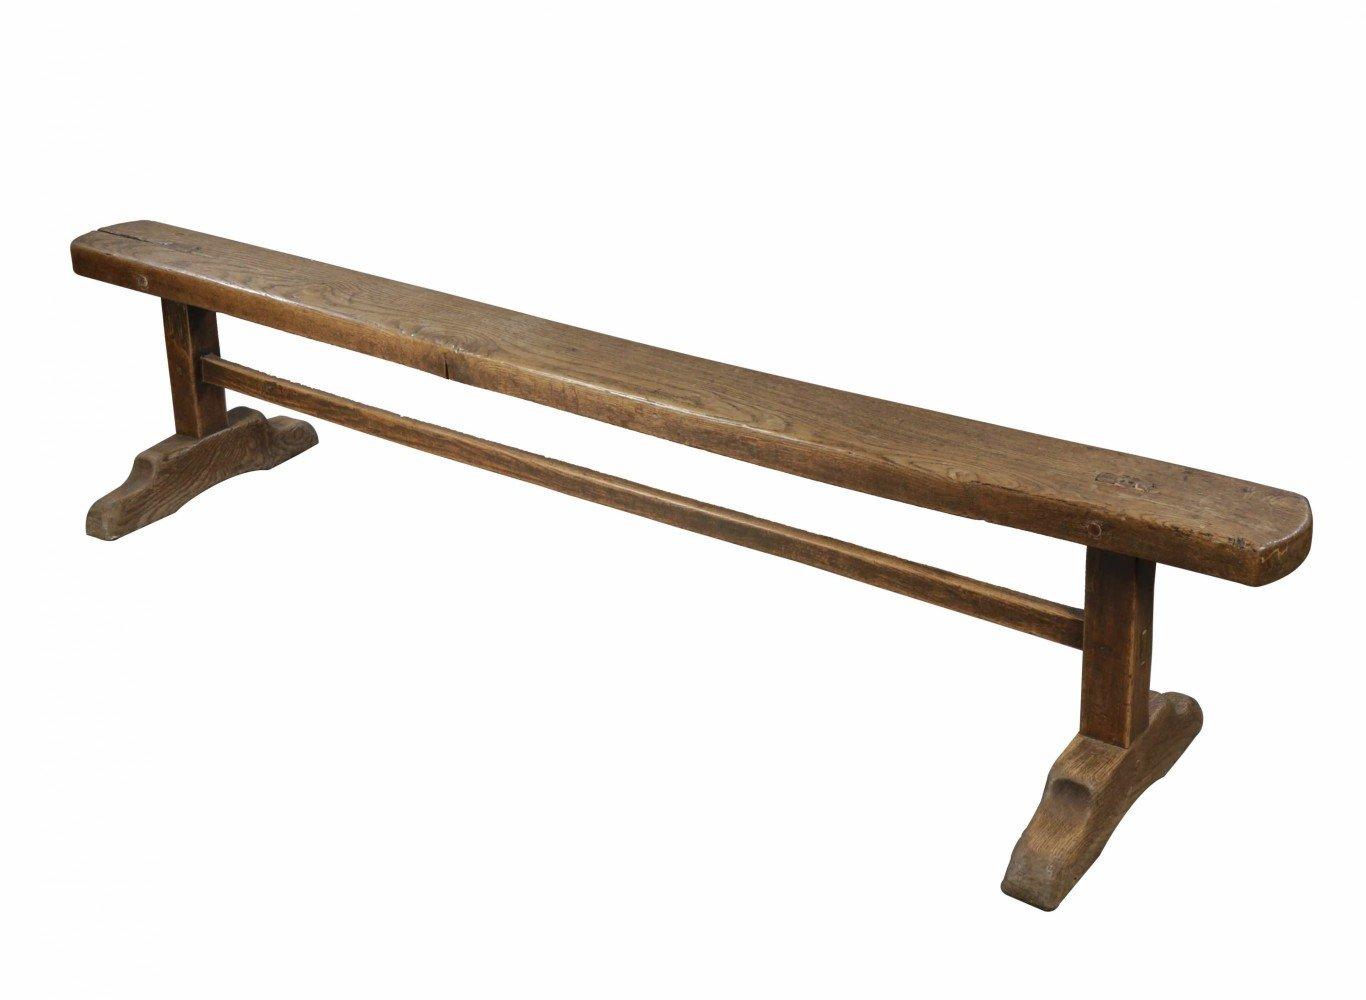 Oak or Elmwood Rustic Bench